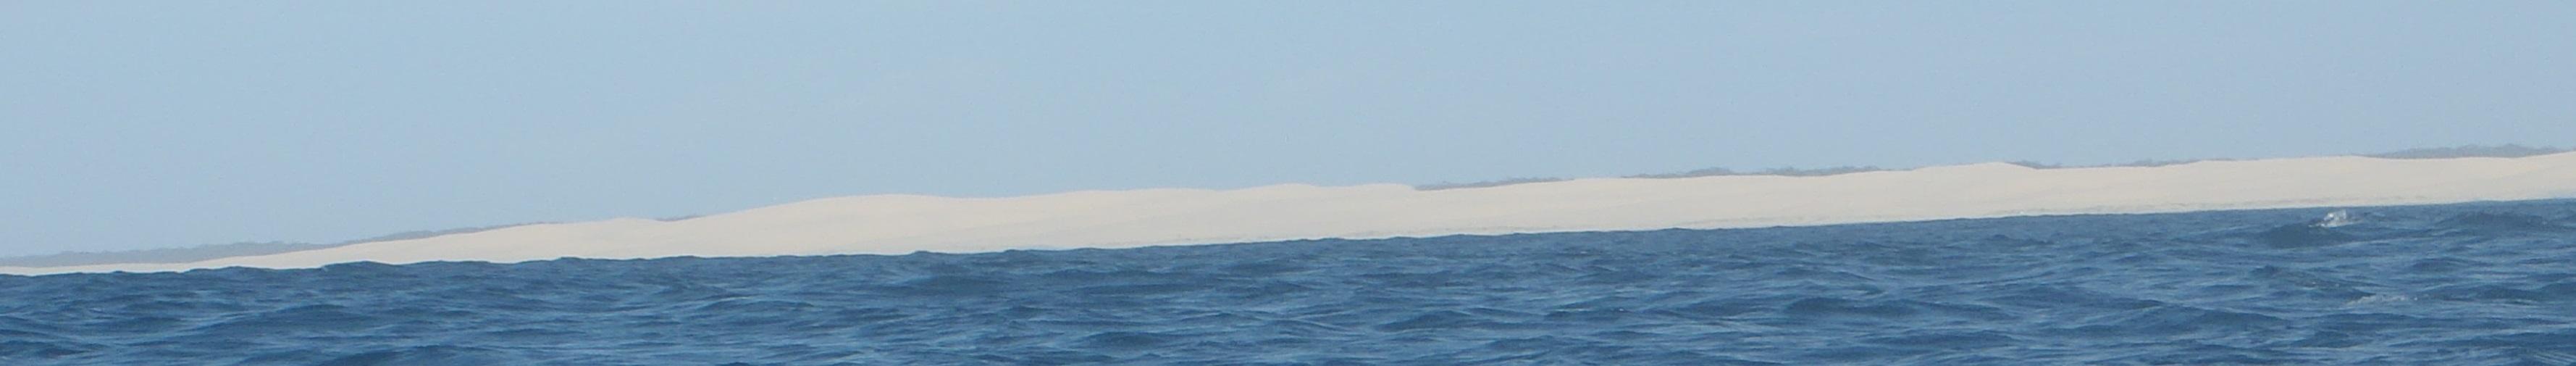 2 sand hills